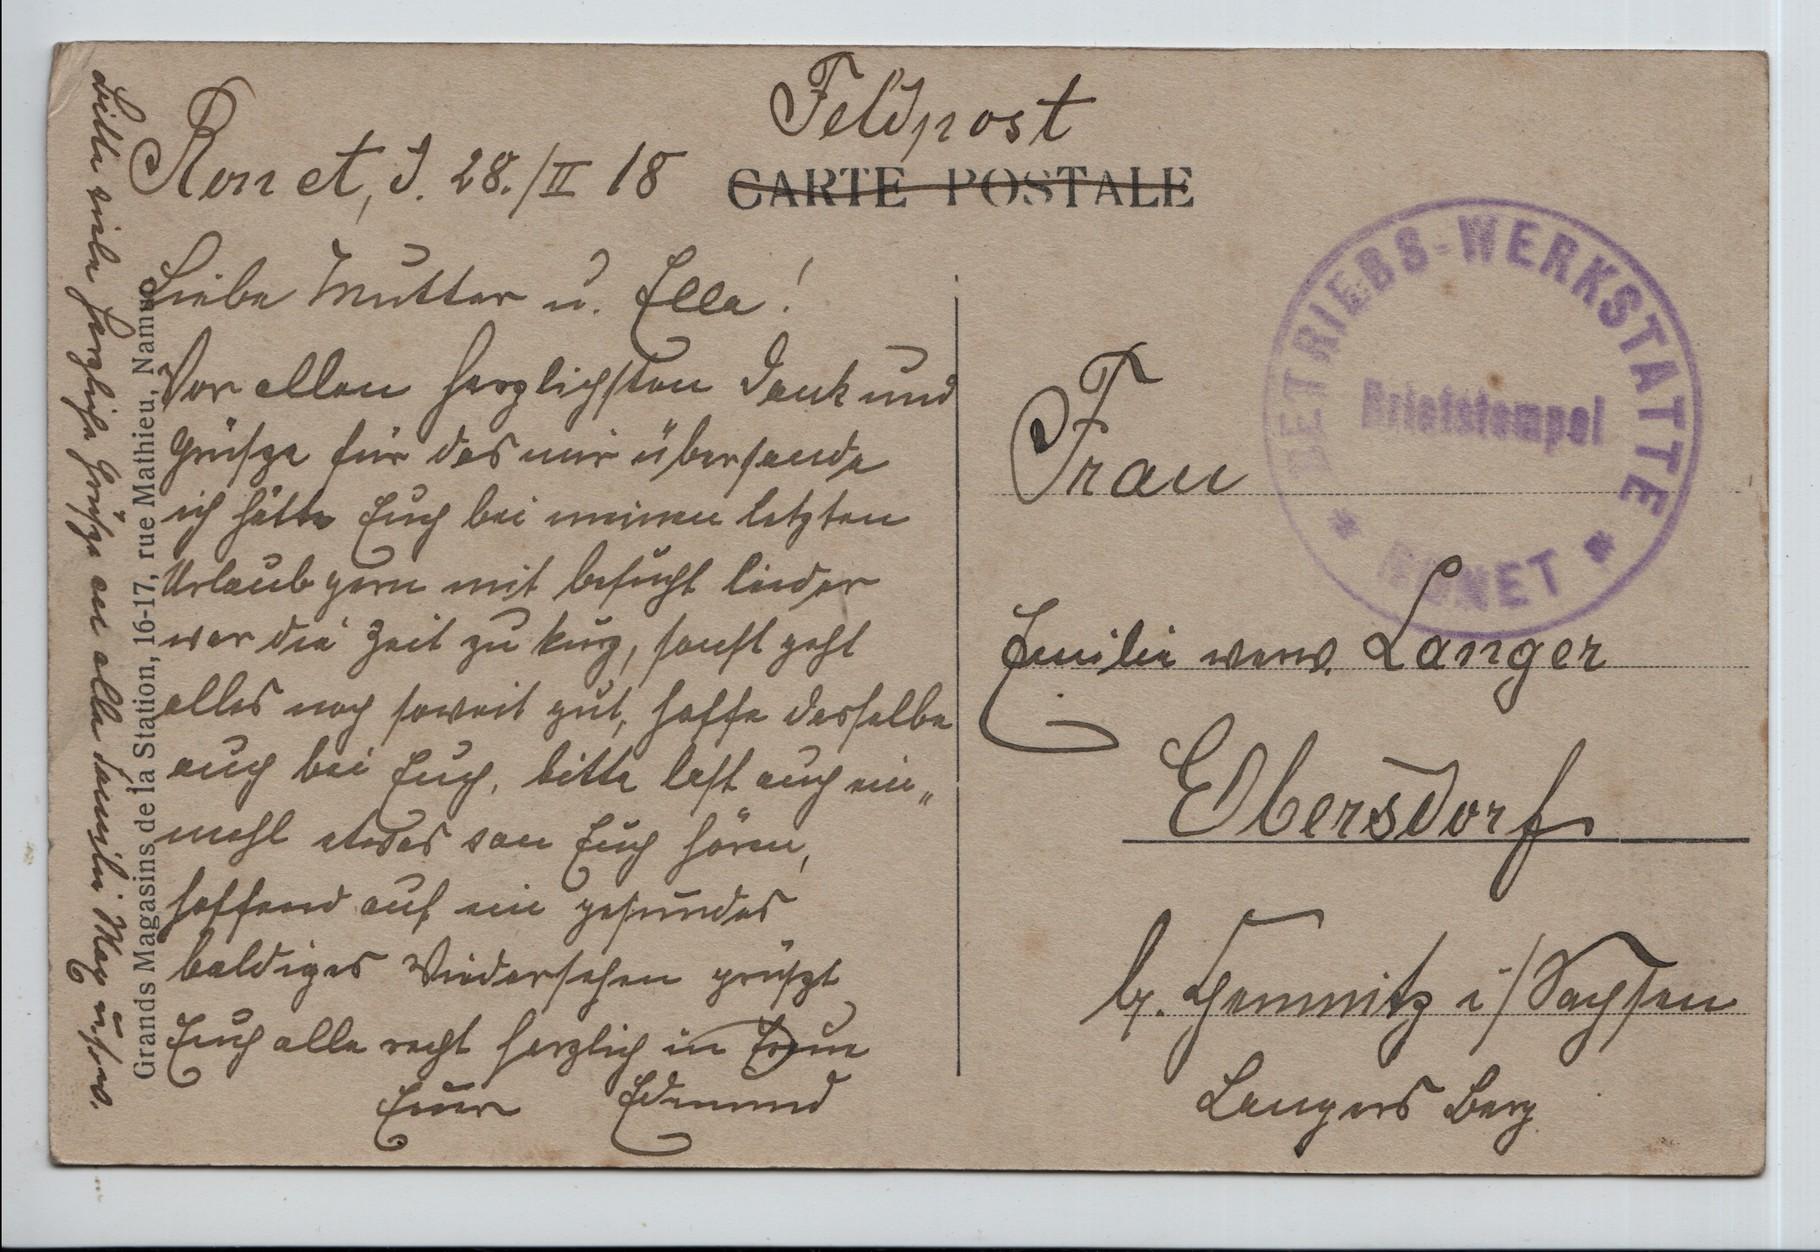 7. 28th Feb 1918